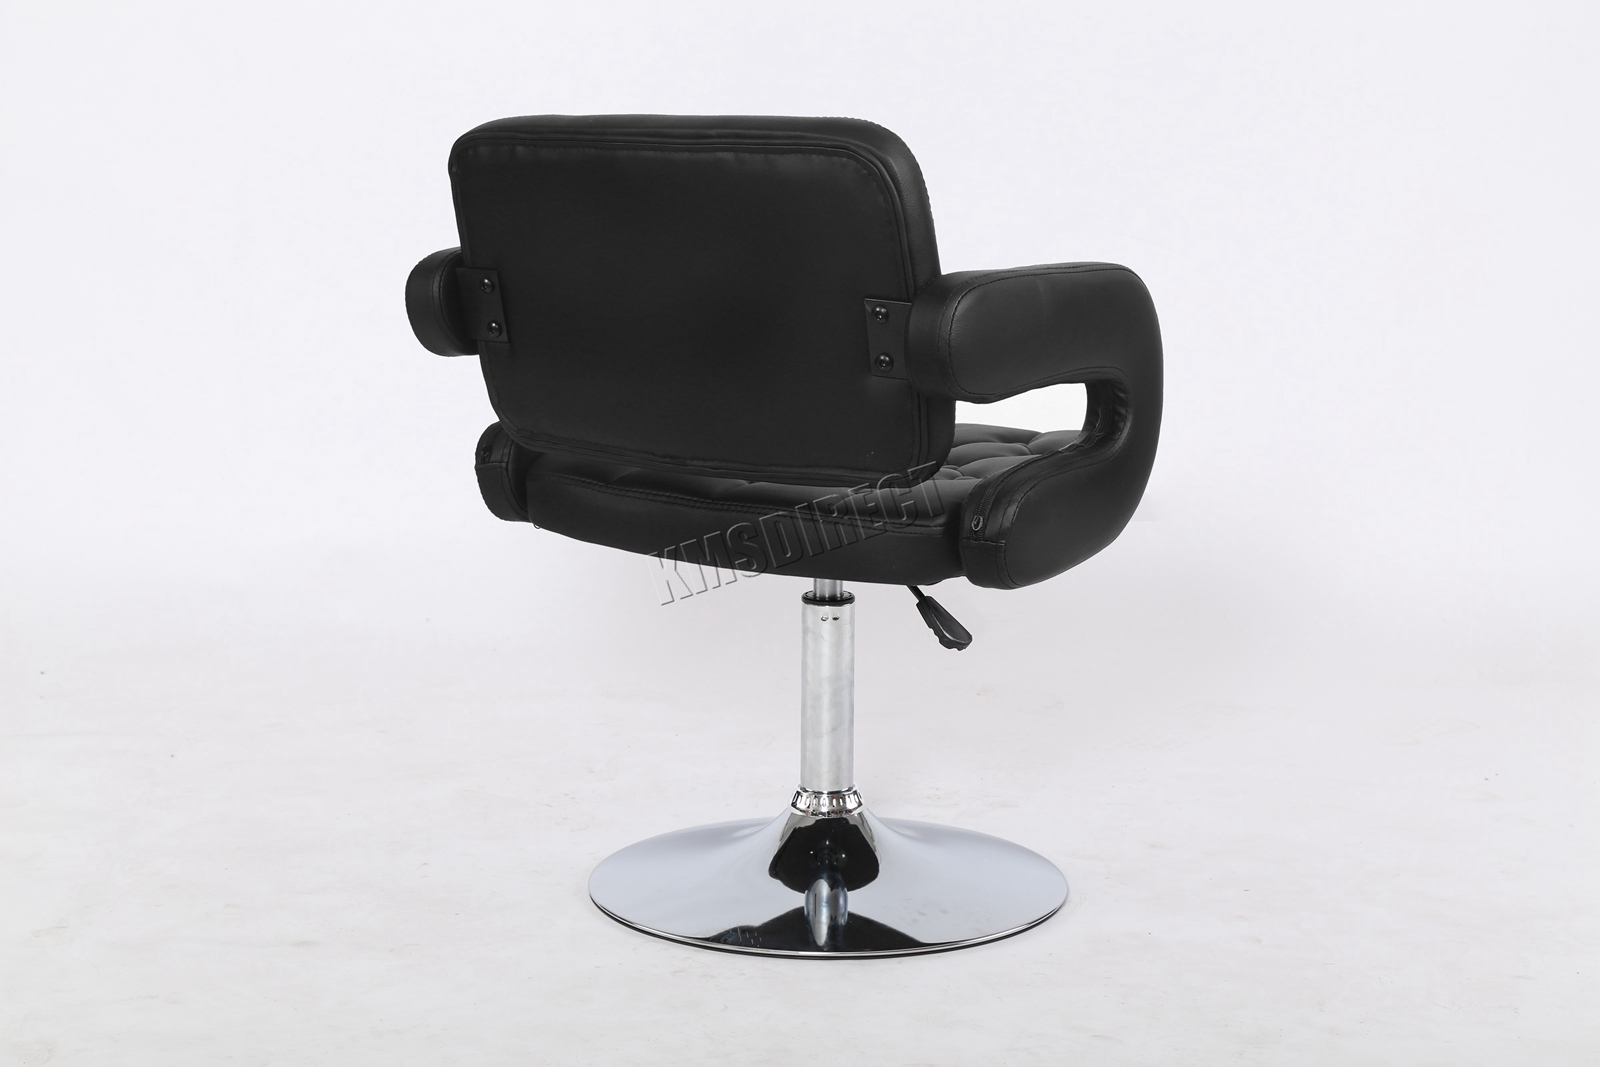 WestWood-Beauty-Salon-Chair-Barber-Hairdressing-Hair-Cut-PU-Leather-Modern-SC02 miniatuur 15